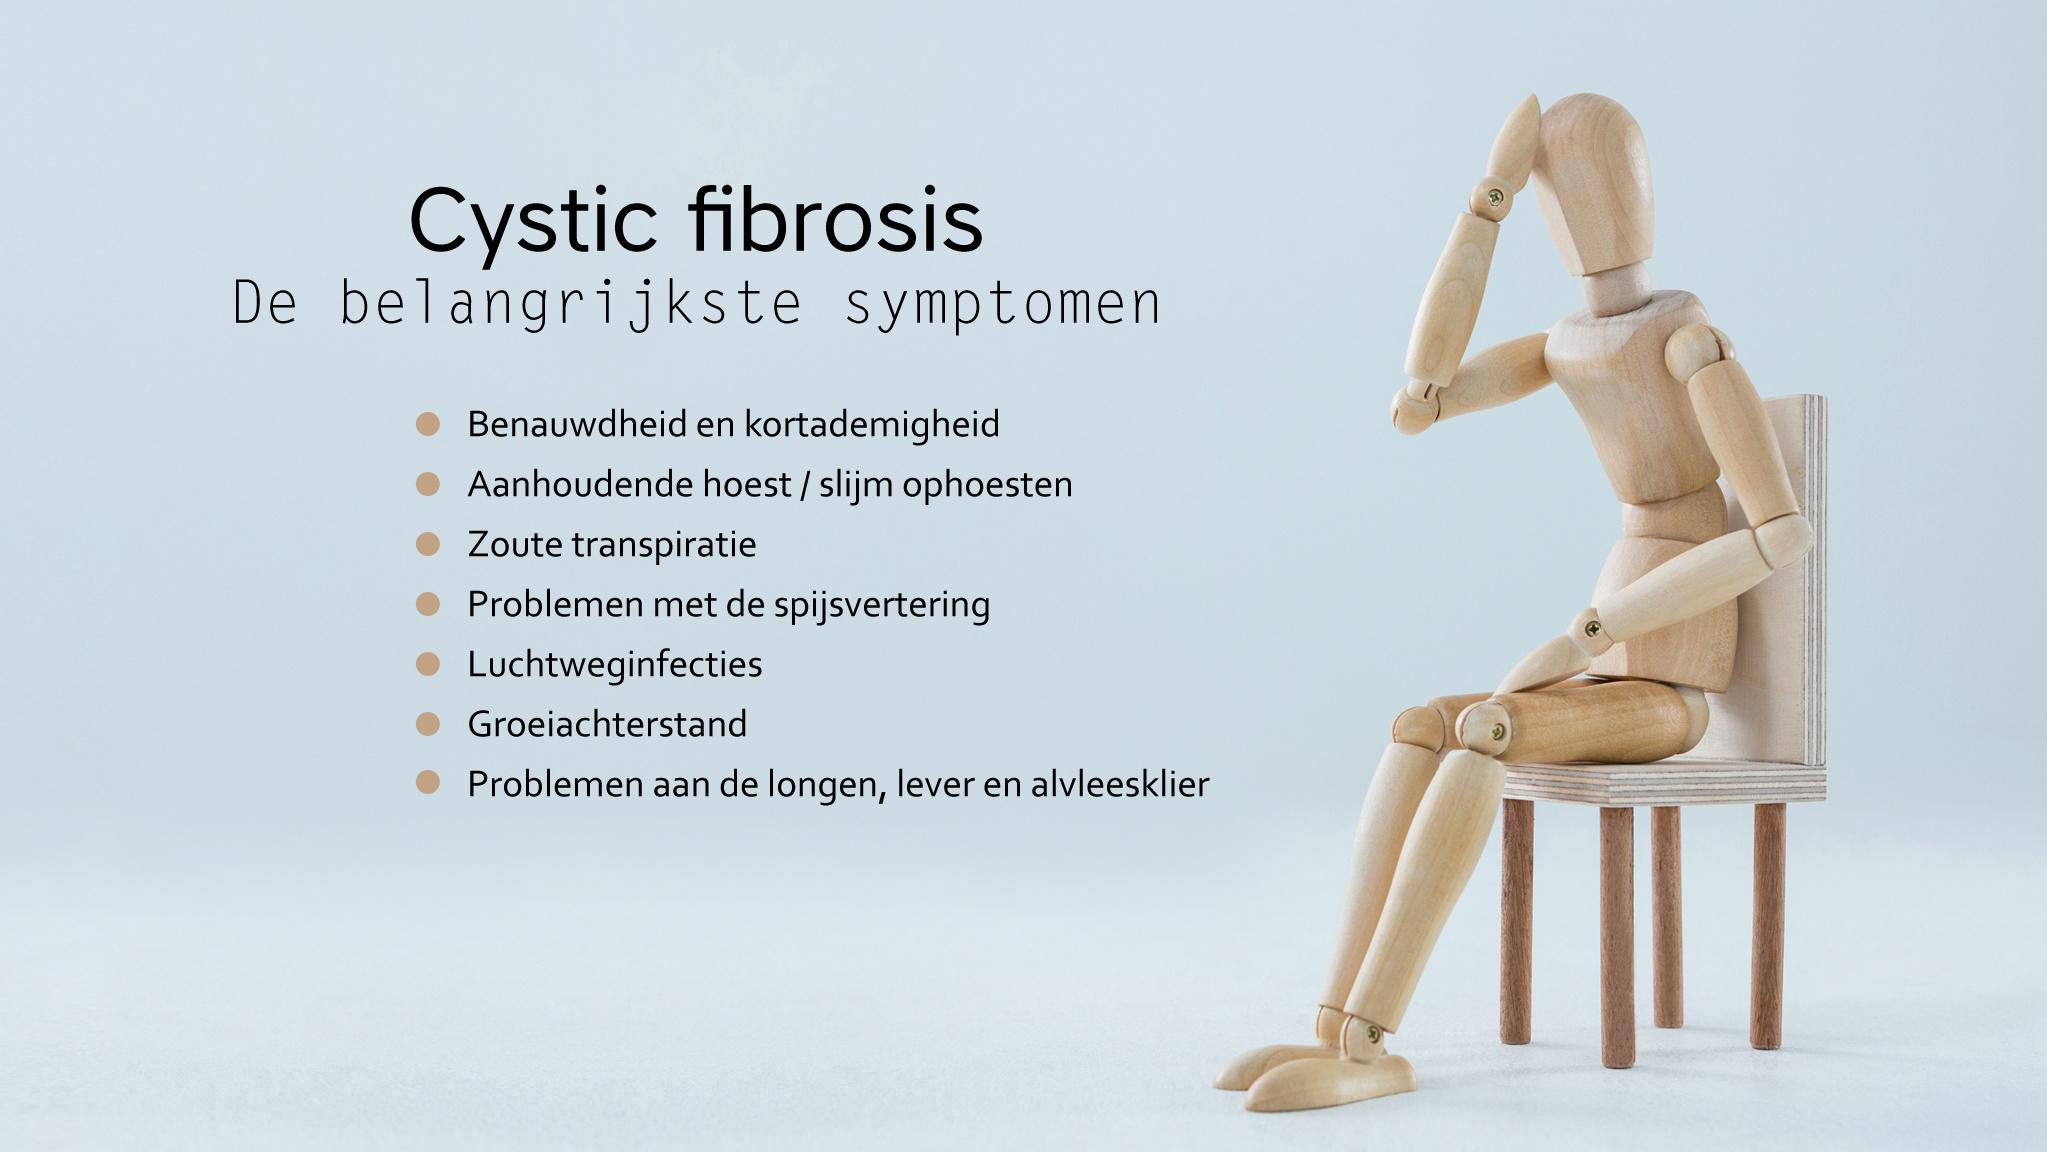 Cystic fibrosis symptomen